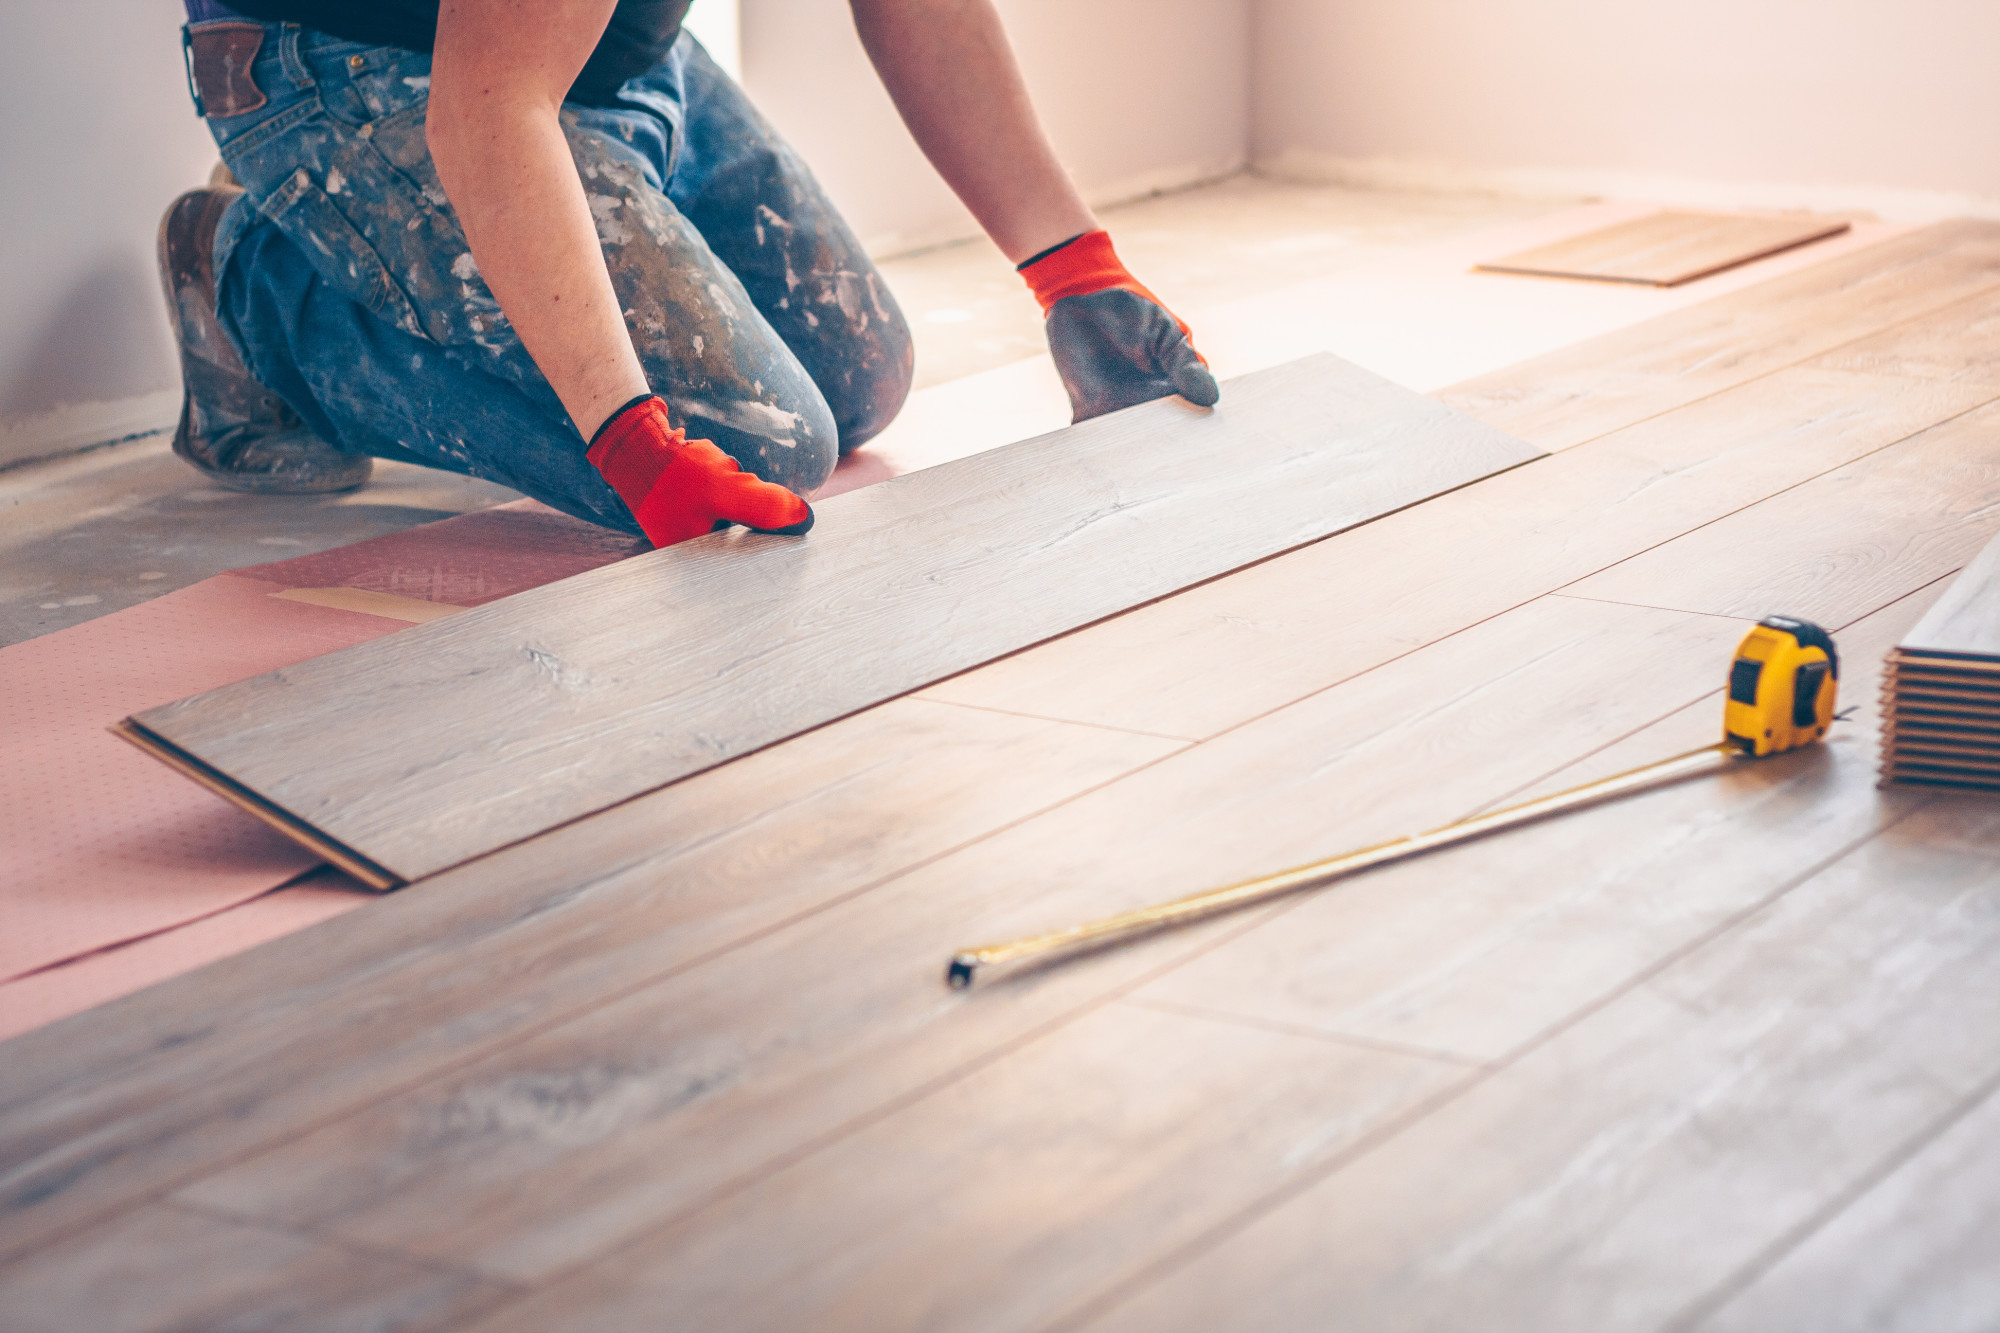 Vinyl Plank vs Hardwood Flooring: Which Should You Choose?